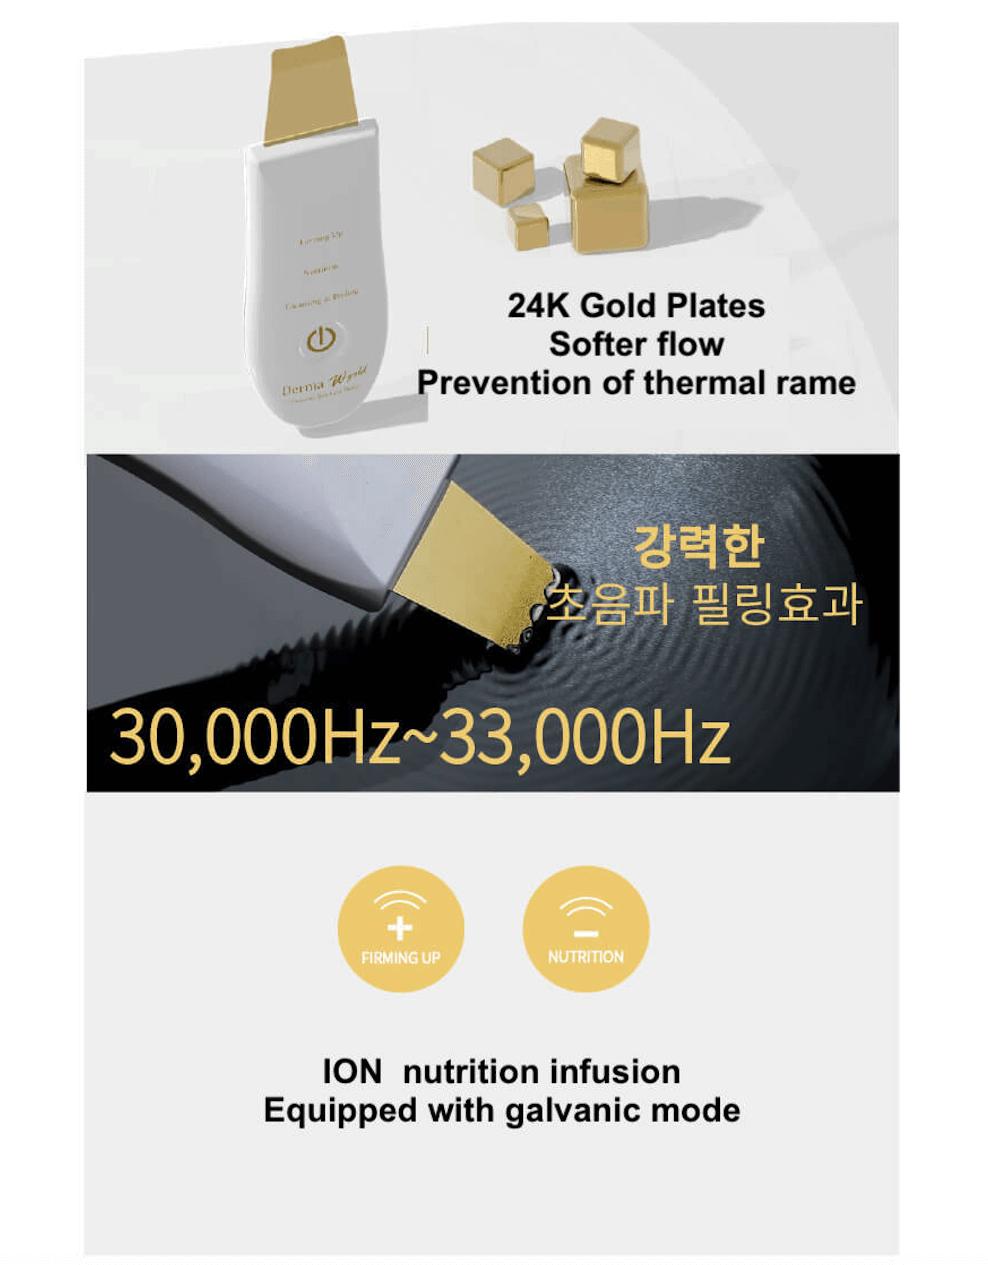 Derma W 24K Gold face spatula 2